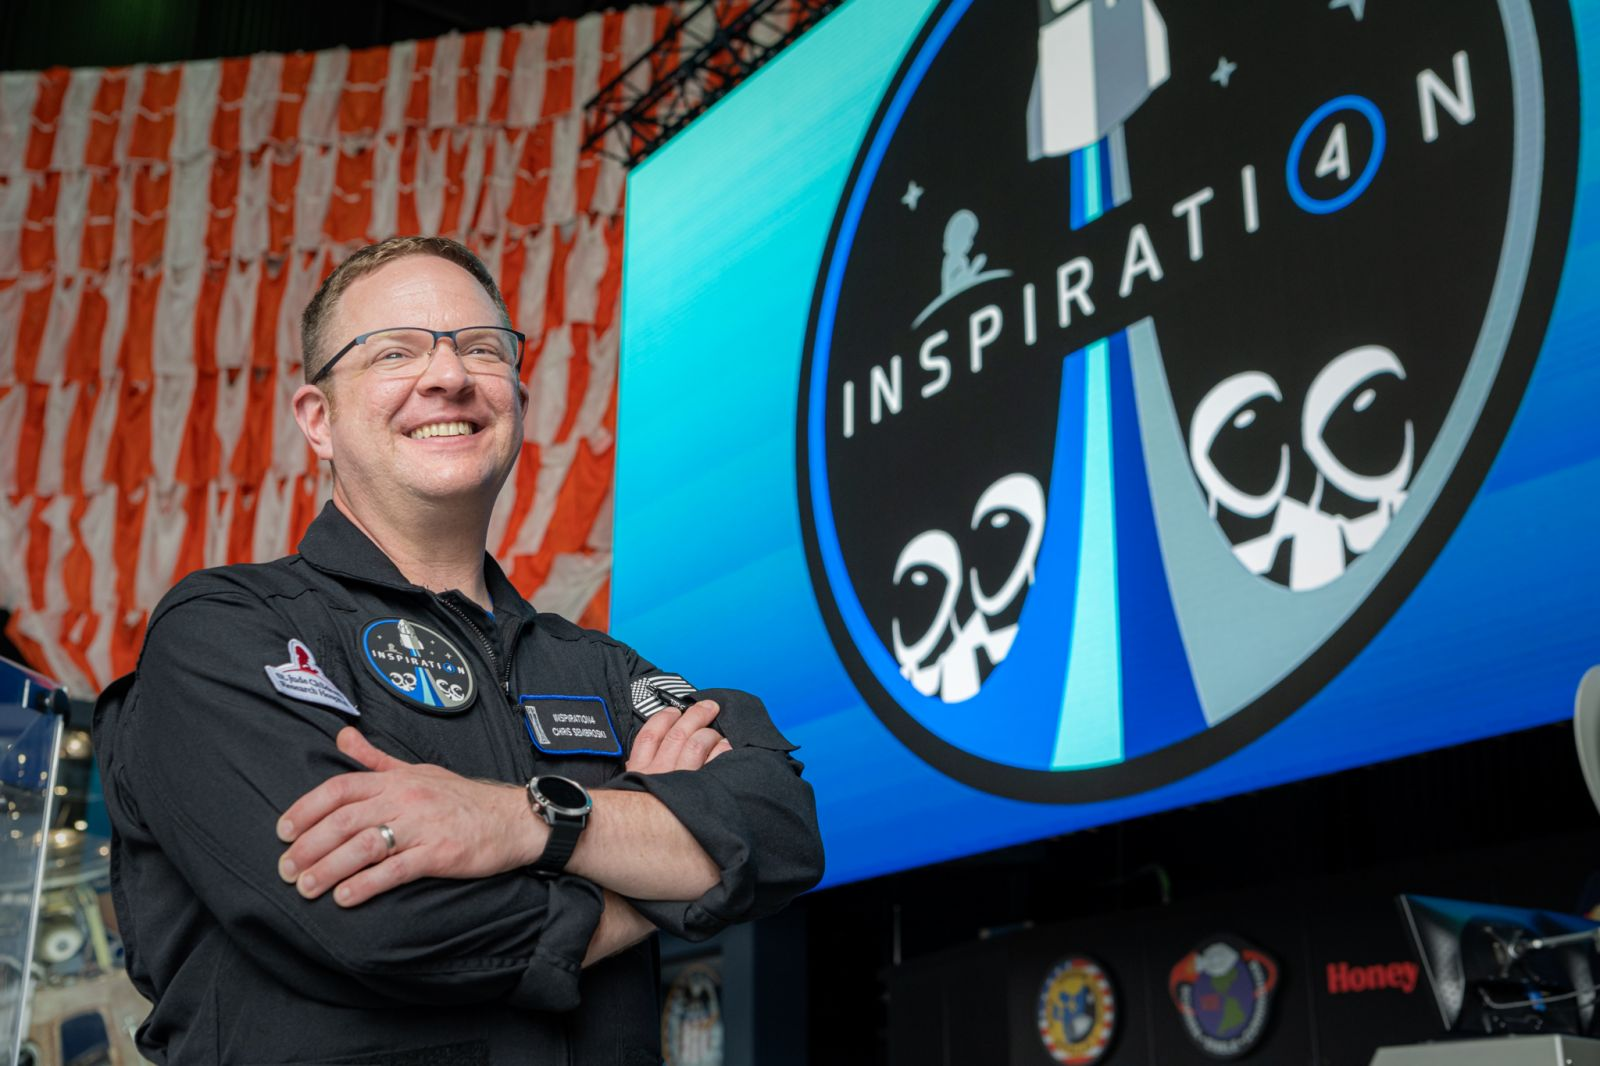 Chris Sembroski while on a visit to Space Camp in Huntsville, Alabama. Credit: Inspiration4 / John Kraus